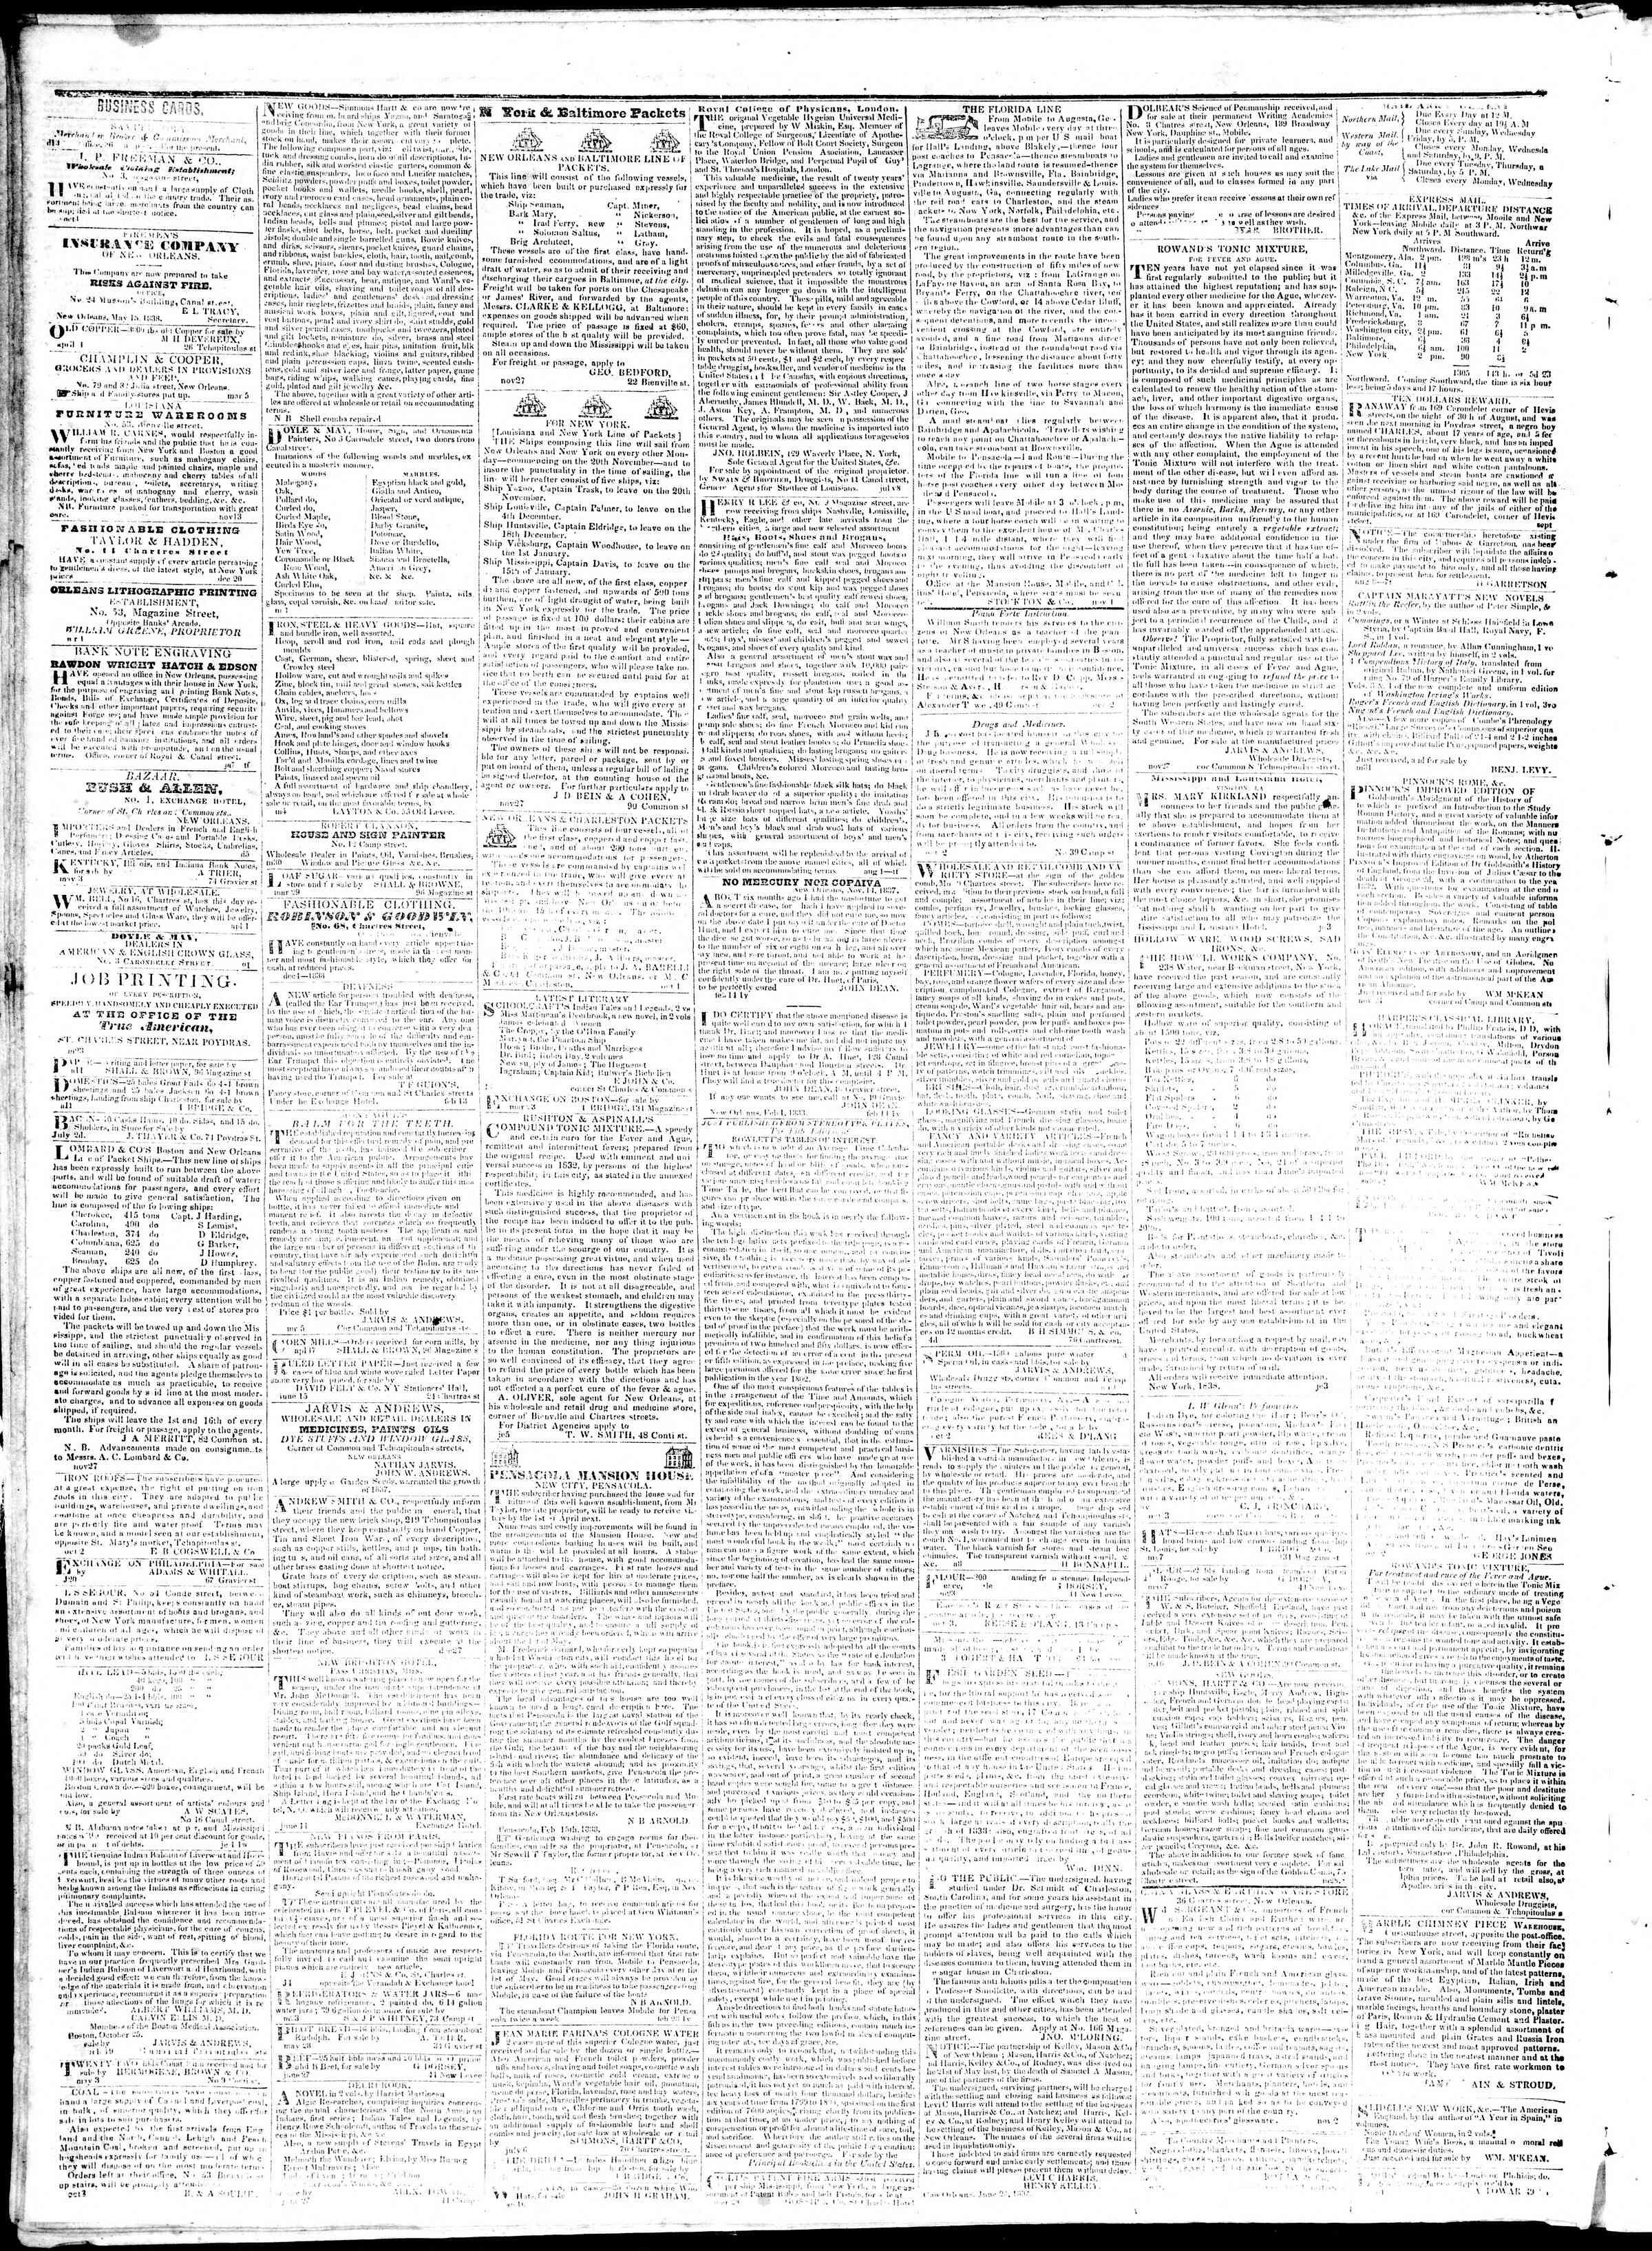 September 5, 1839 Tarihli True American Gazetesi Sayfa 4